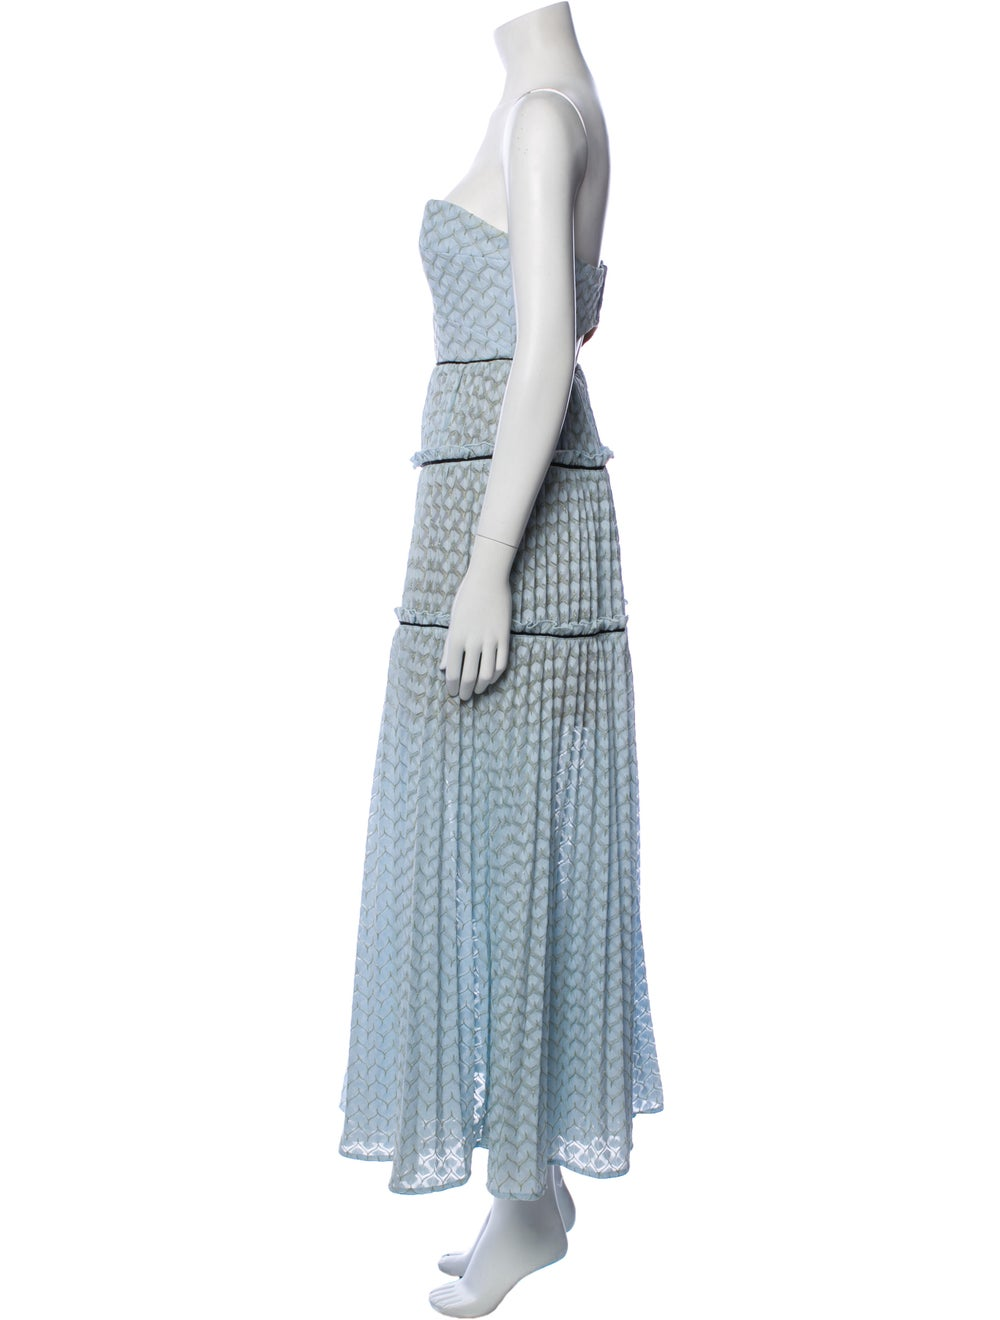 Self-Portrait Printed Midi Length Dress Blue - image 2